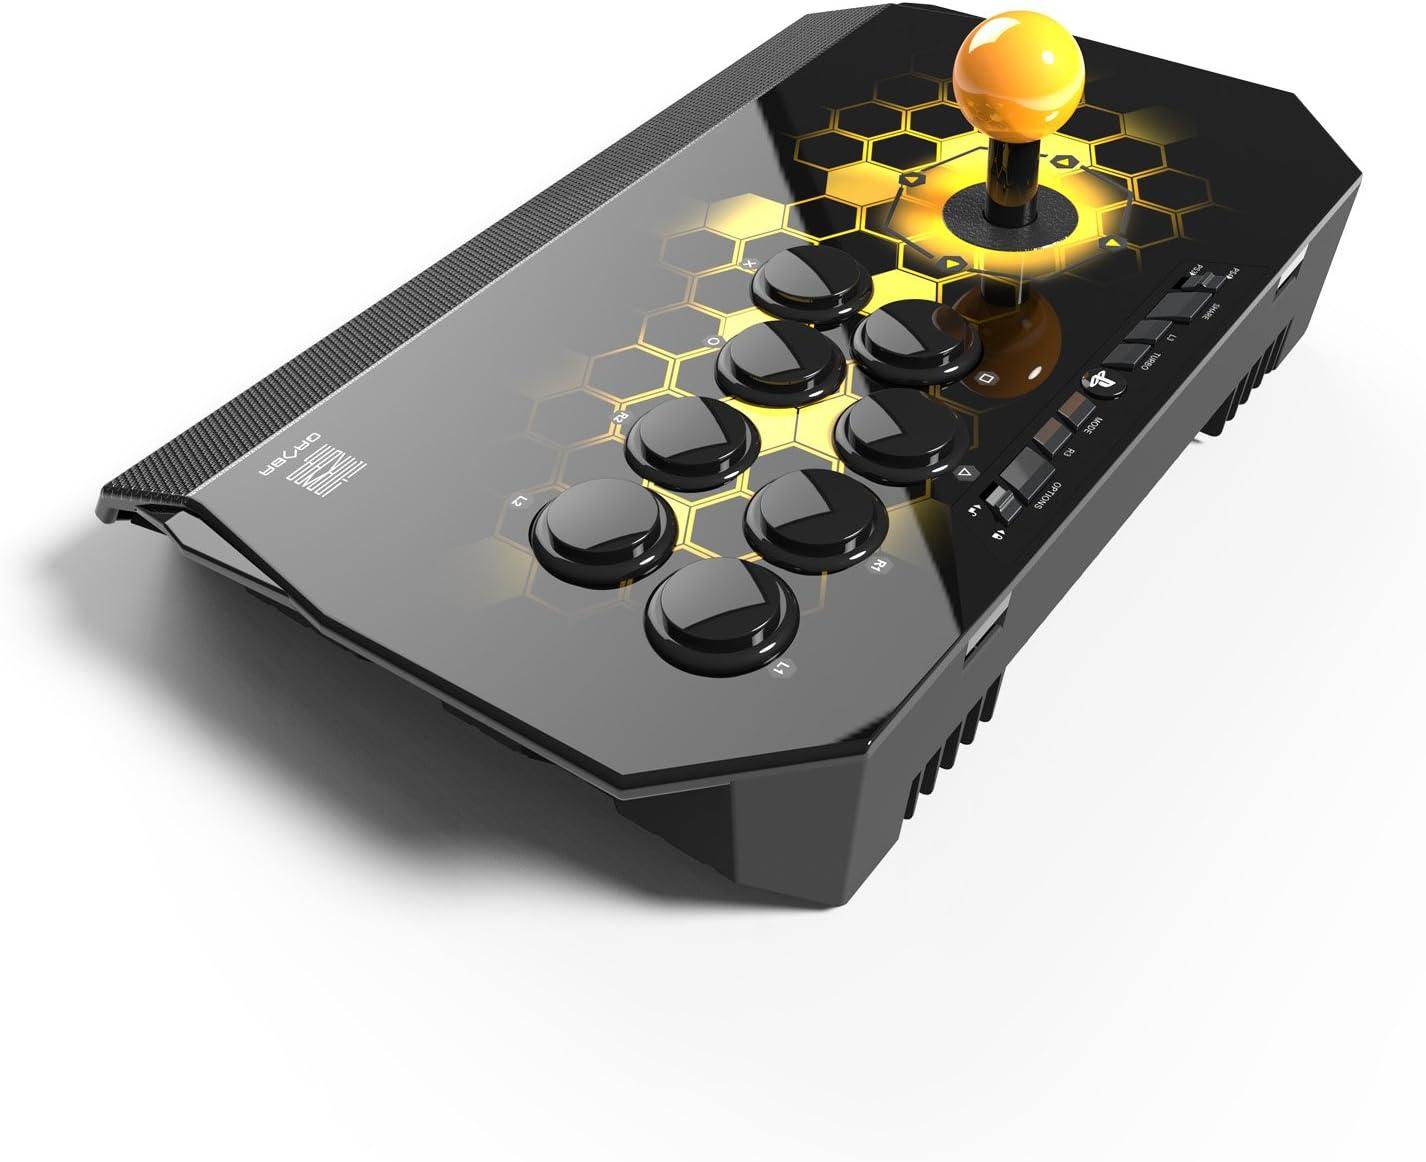 marque+inconnue qanba +-+ Arcade + Stick +-+ Drone +% 28ps4% 2fps3 ...